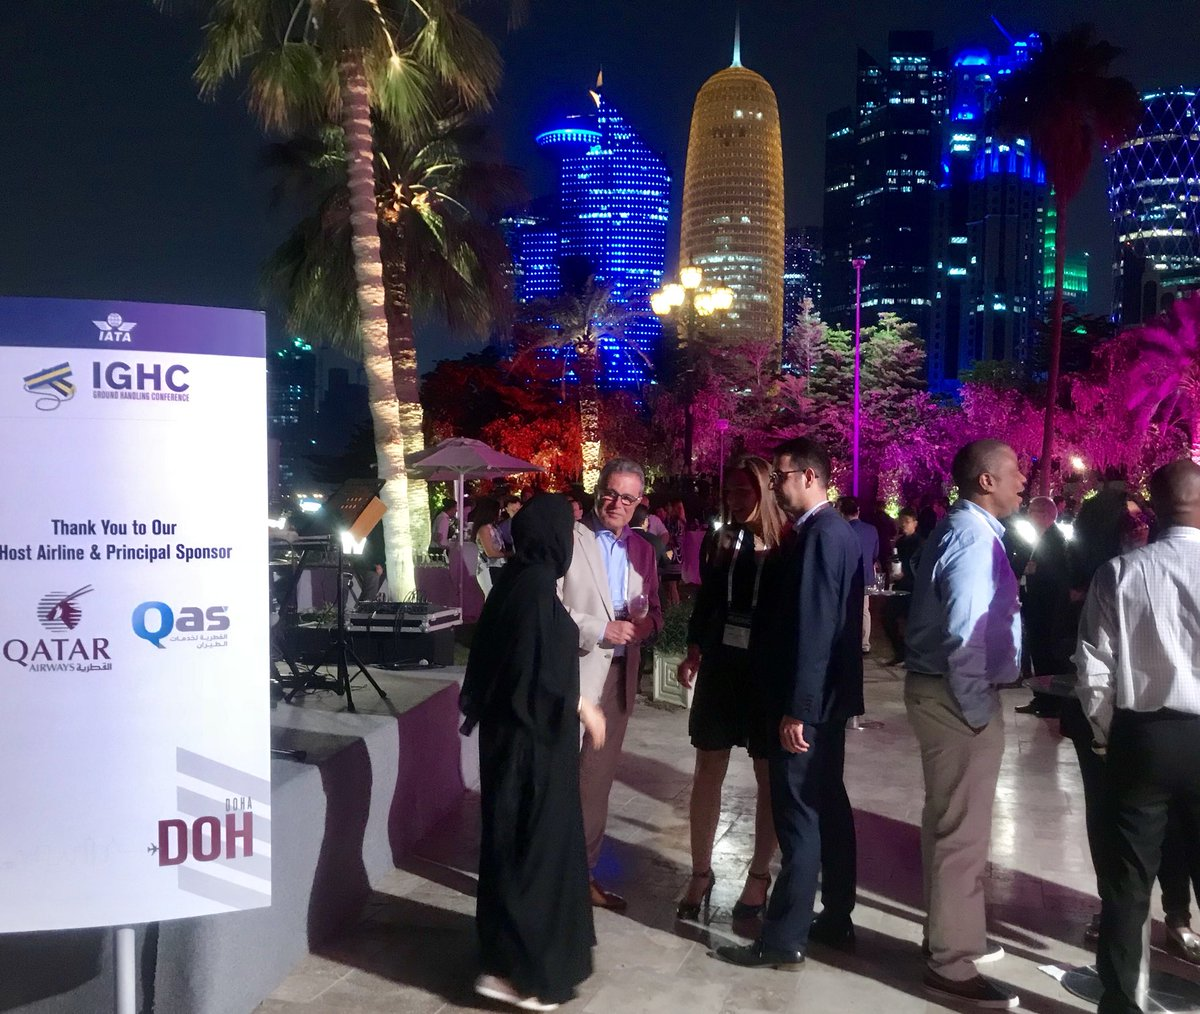 Doha připojte